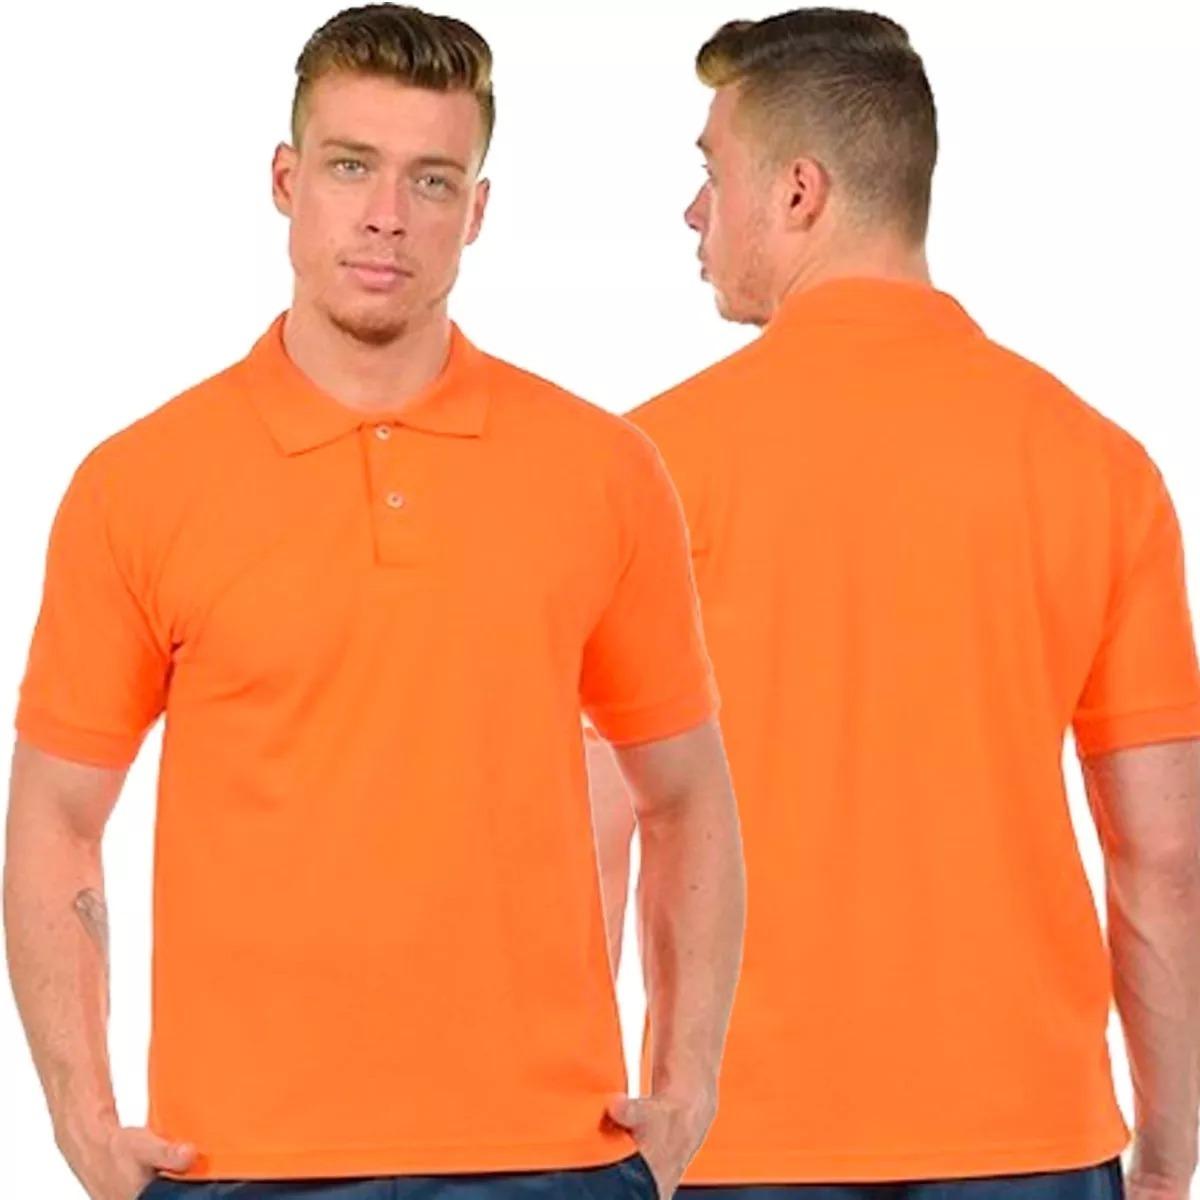 f7a2172b98 Kit 5 Camisas Polo Masculina Camiseta Gola Atacado Uniforme - R  143 ...